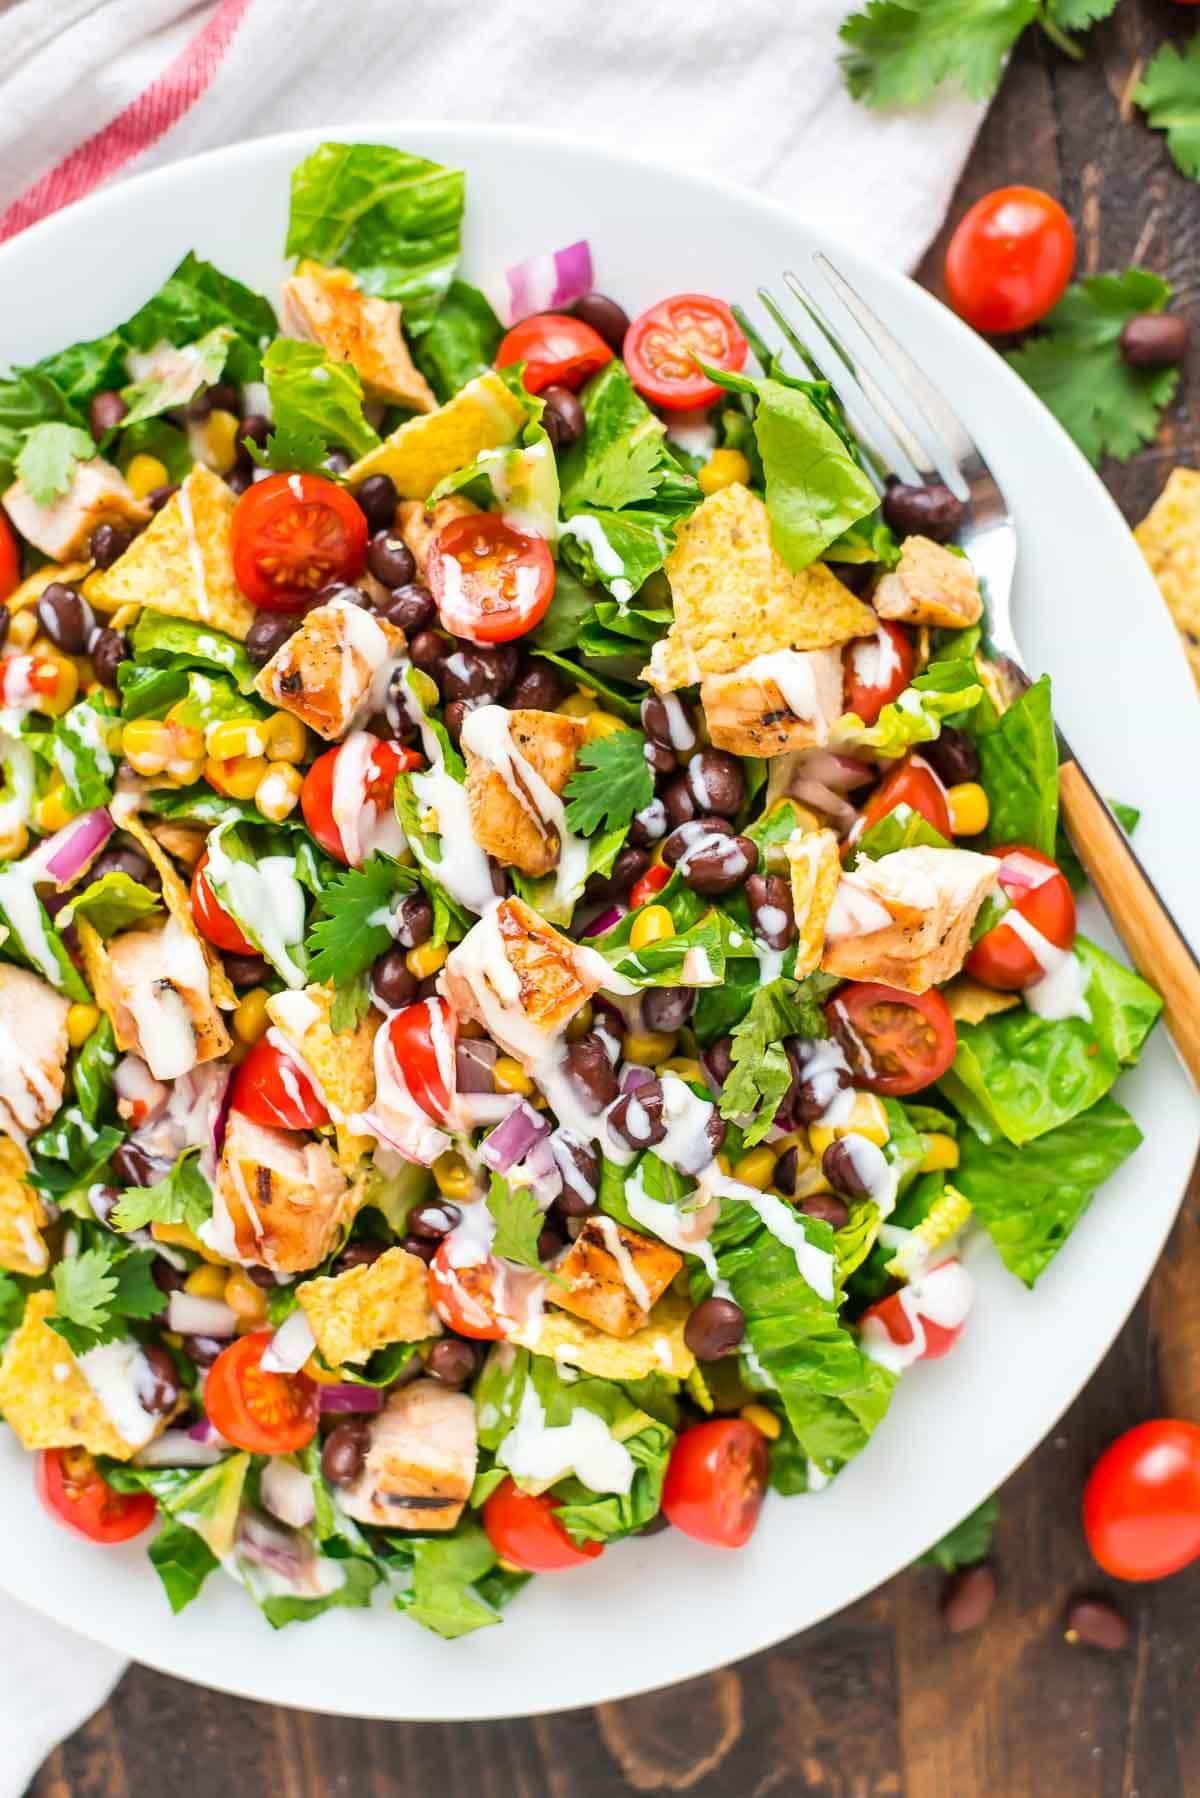 Healthy Salads Recipes  BBQ Chicken Salad with Creamy Ranch